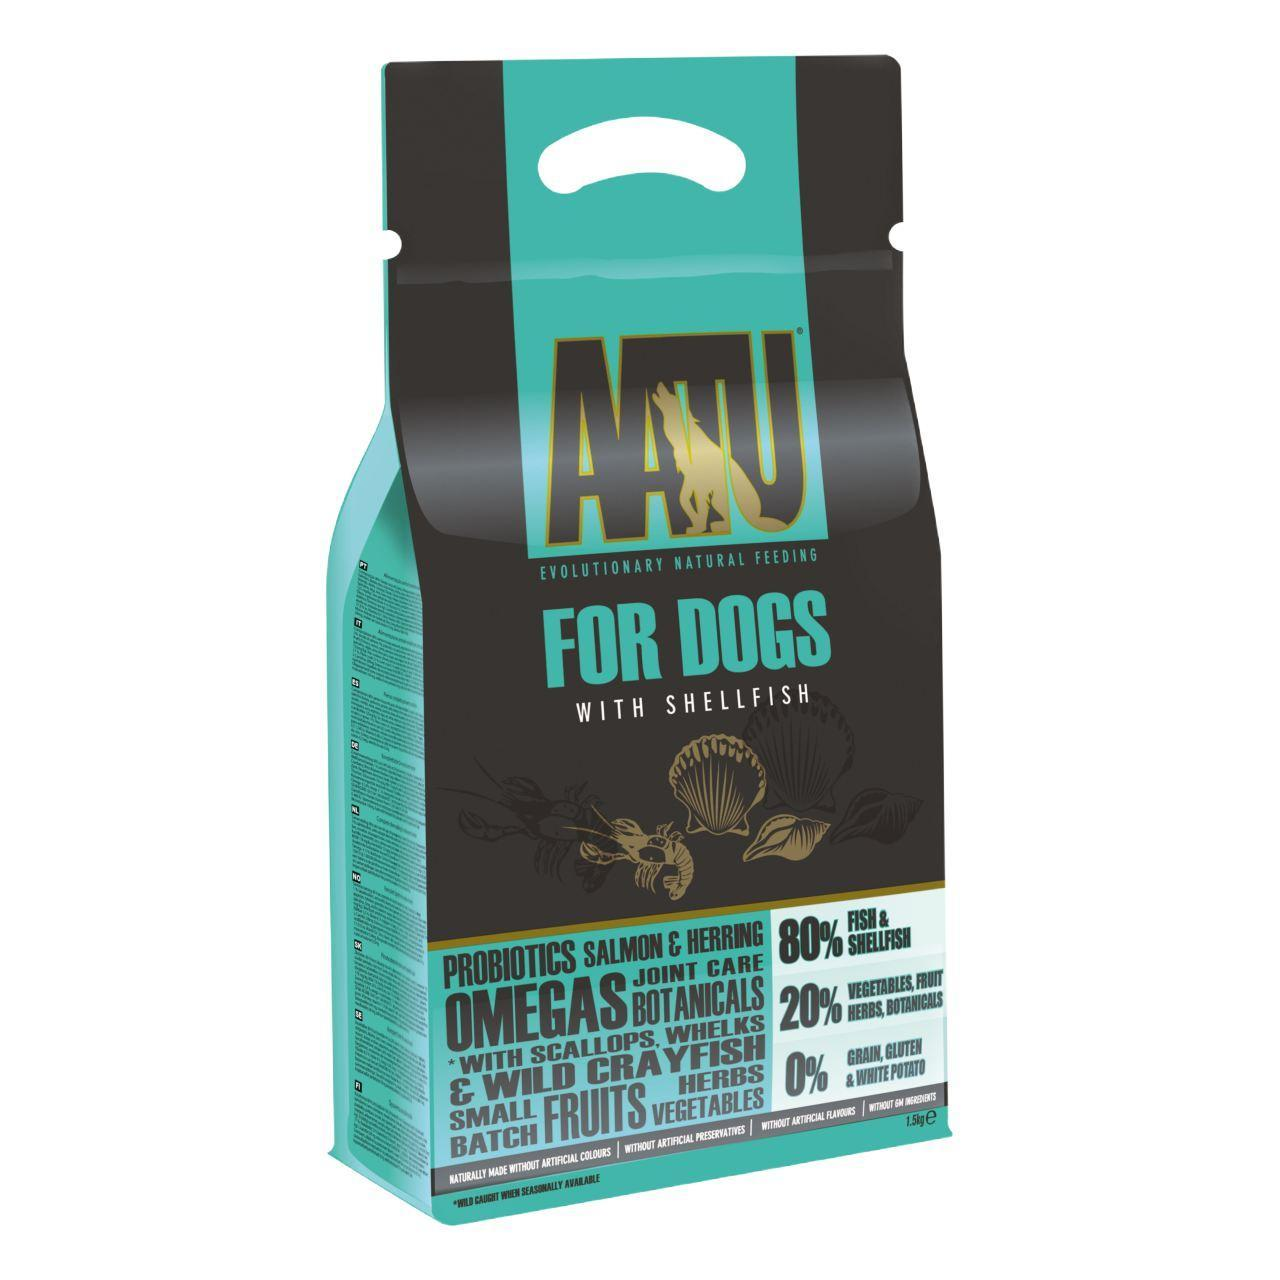 An image of AATU 80/20 Shellfish Complete Grain Free Dry Dog Food